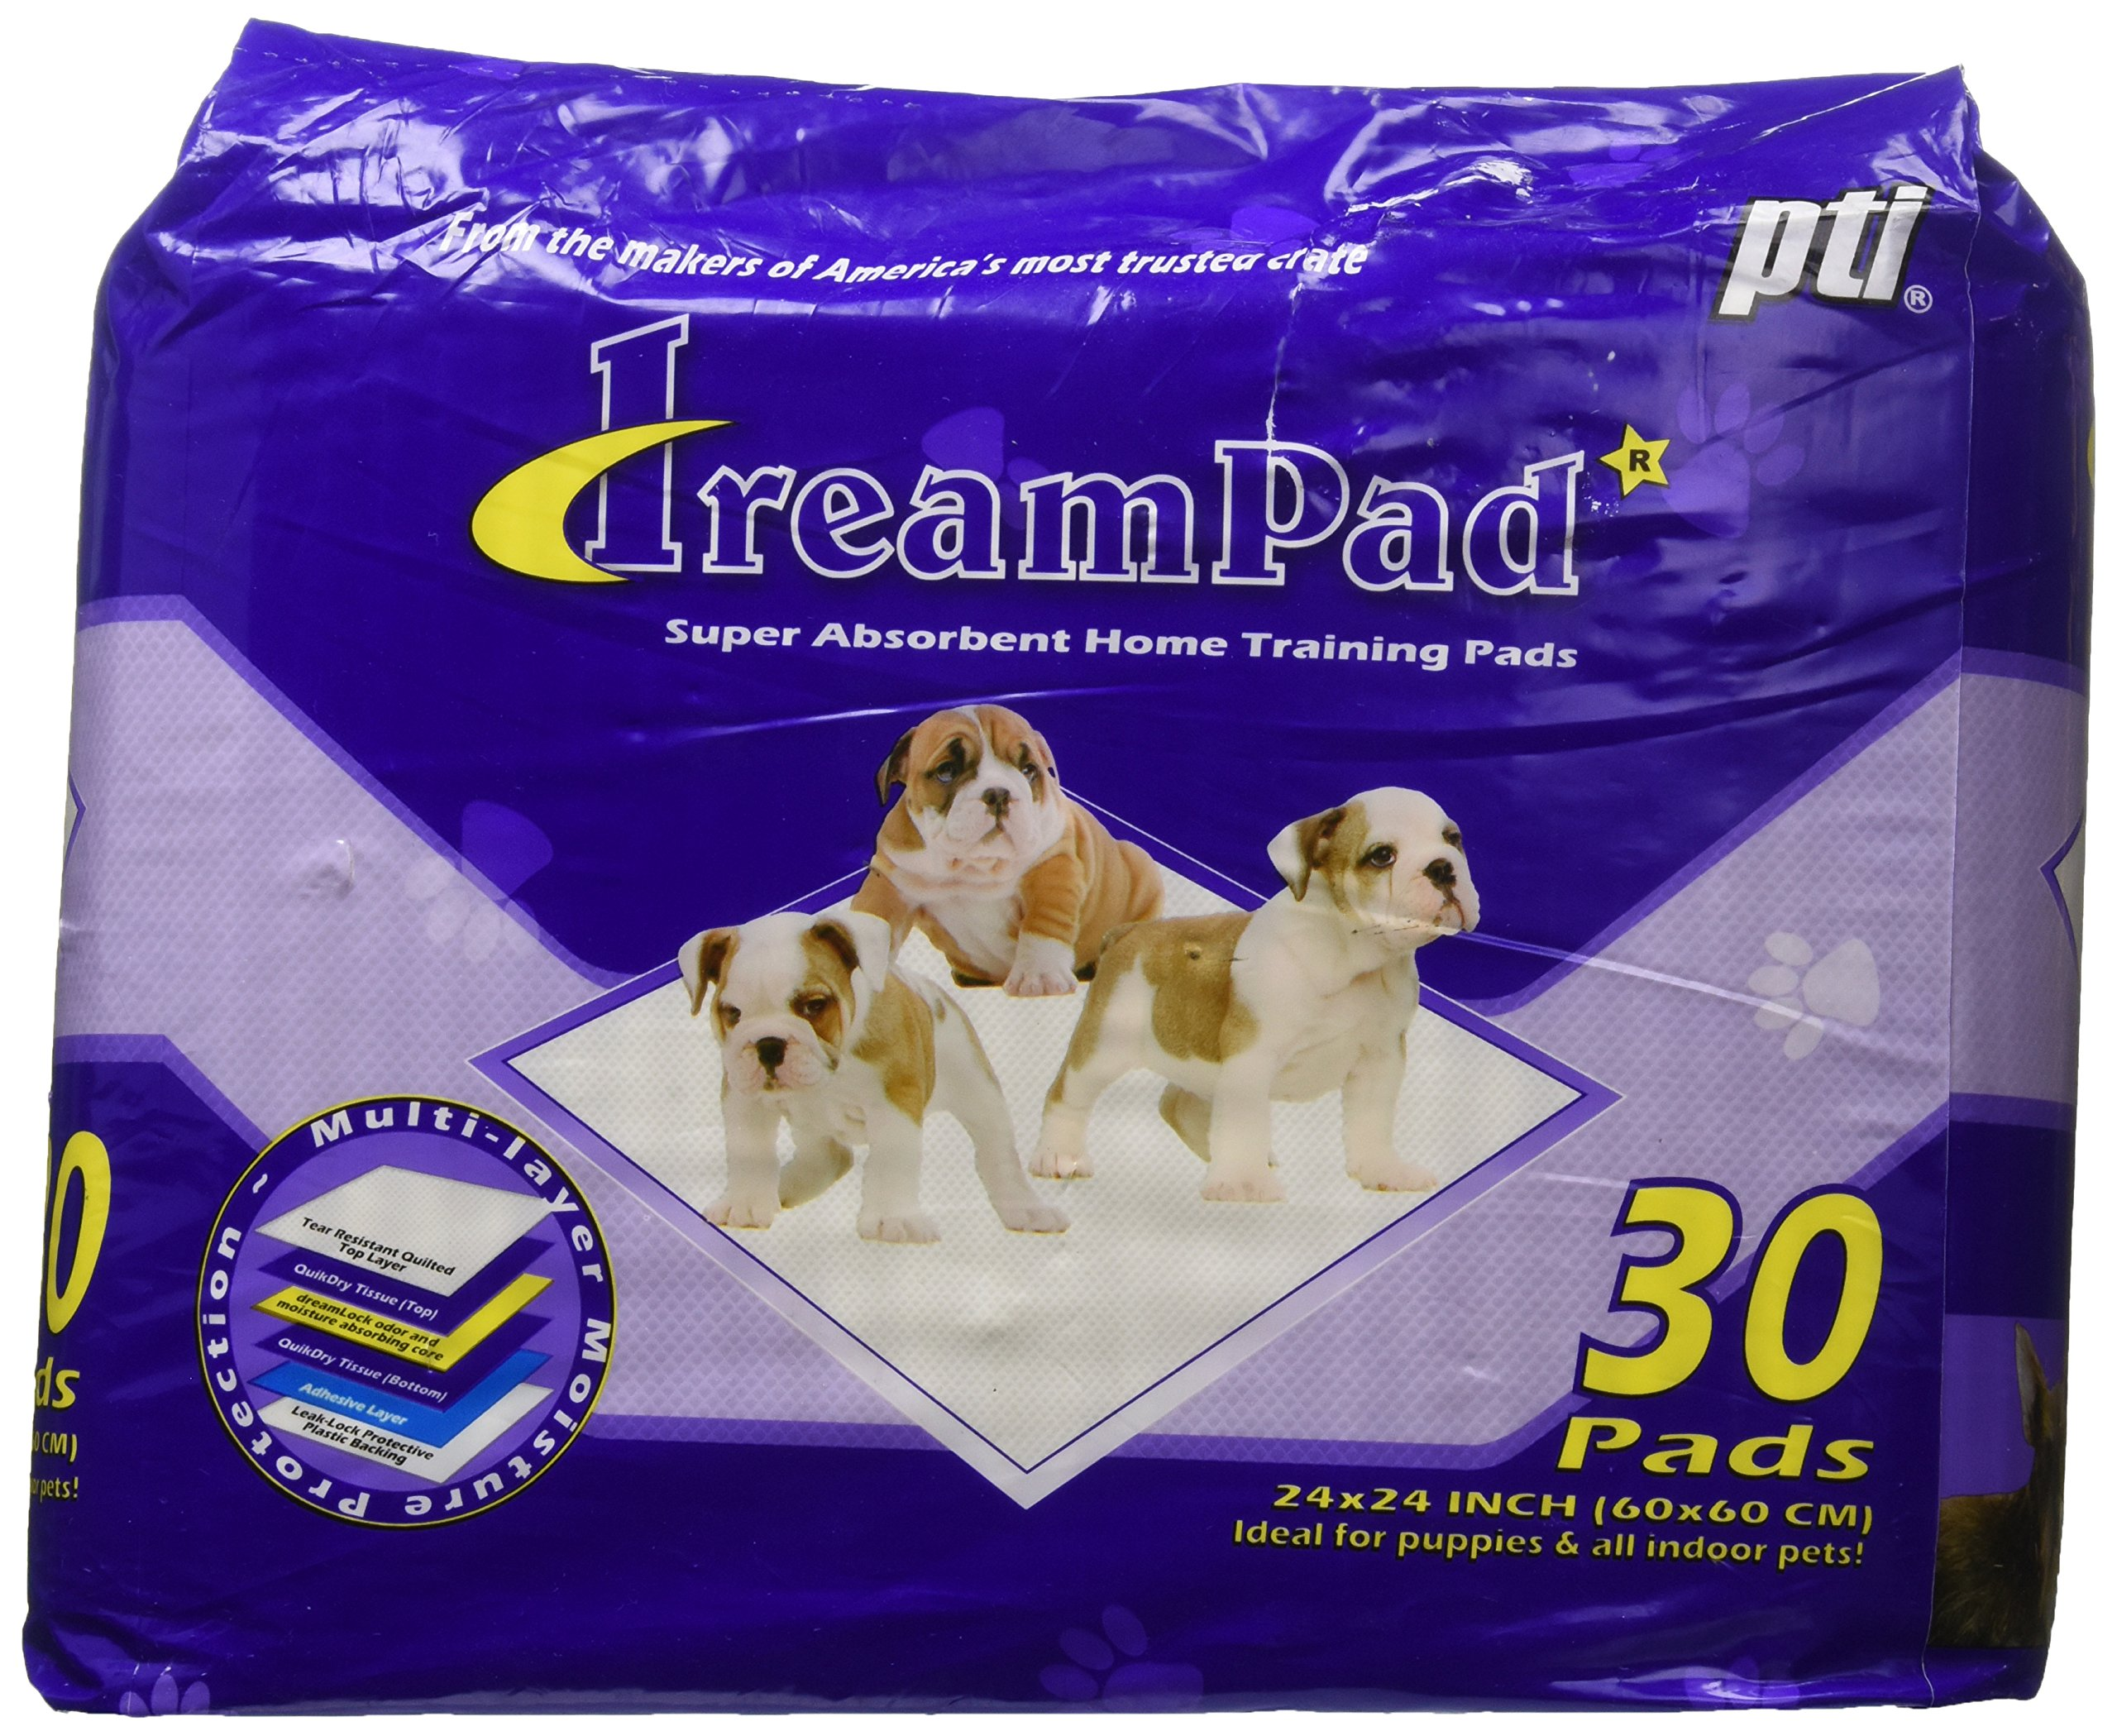 Pet Tek DPK82030 30-Pack Dream Pad Super Absorbent Home Dog Training Pad, Case of 6